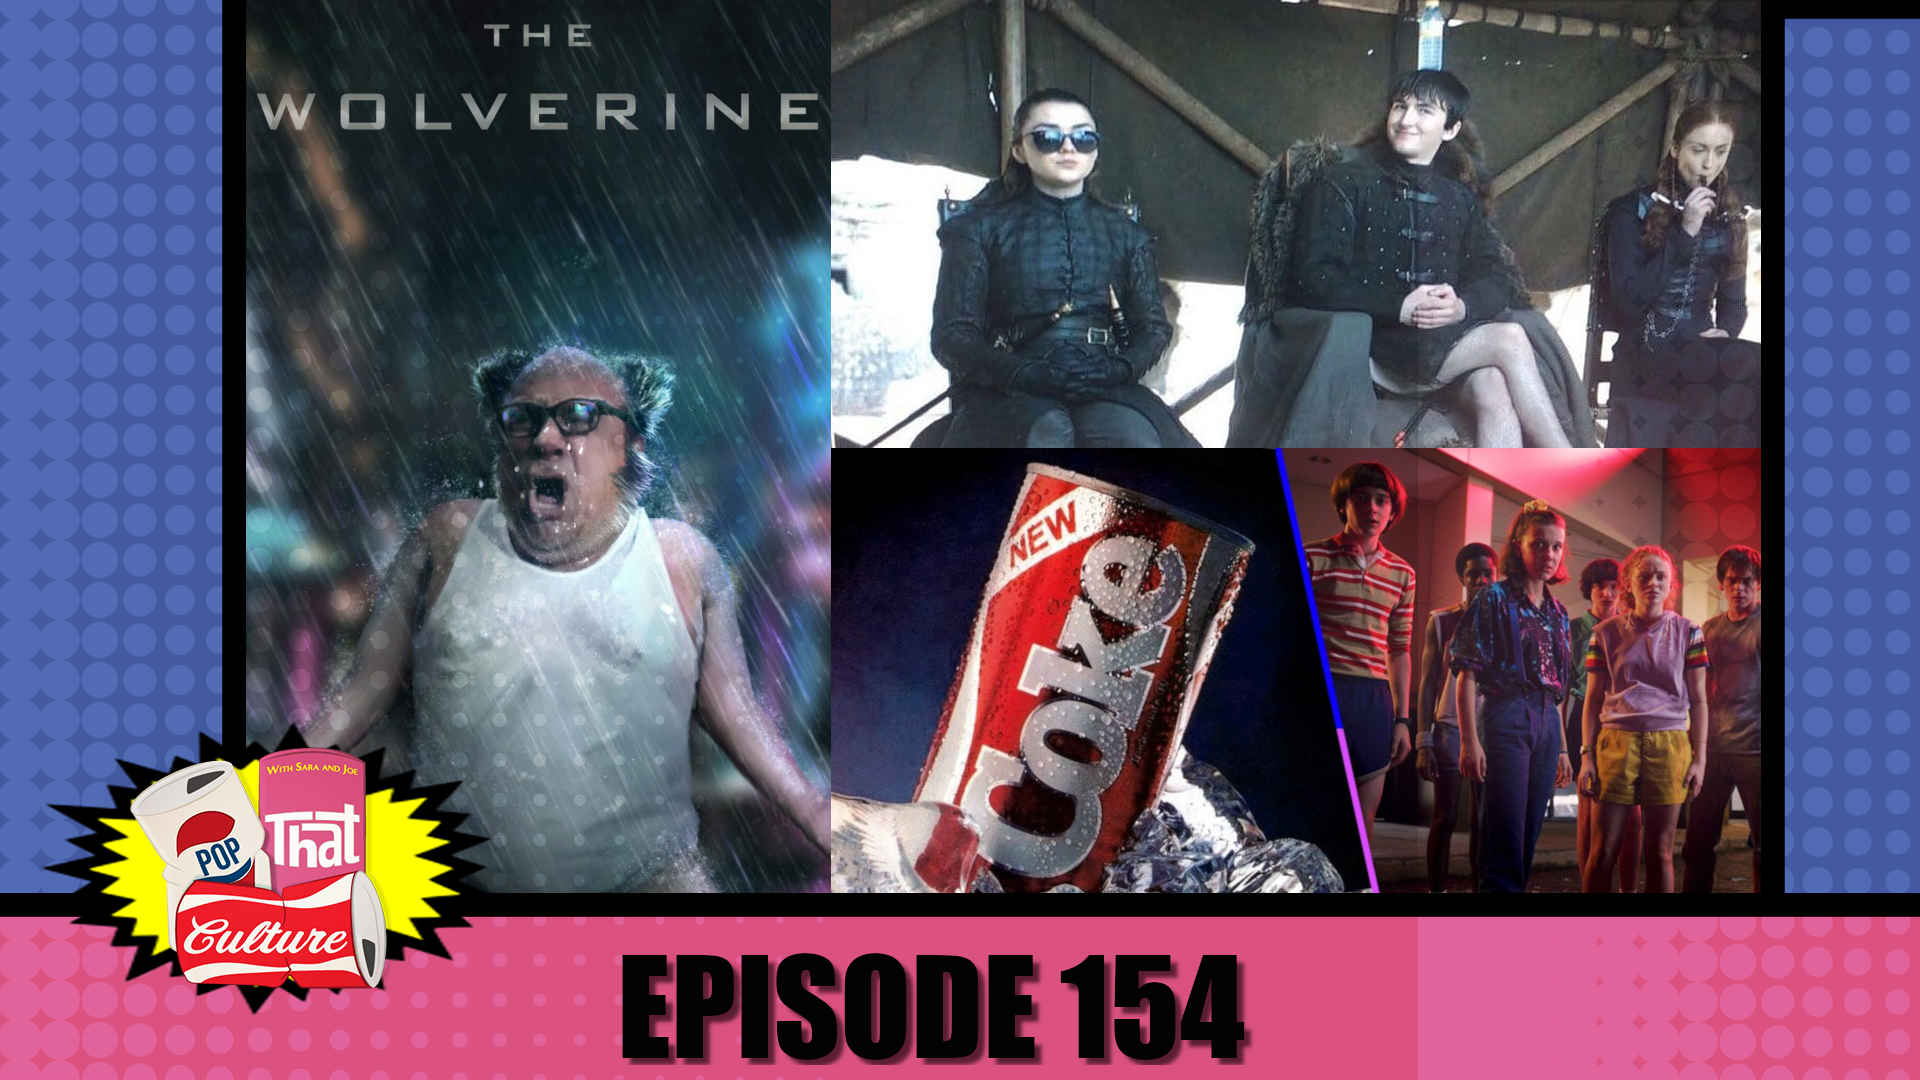 Pop That Culture - Episode 154